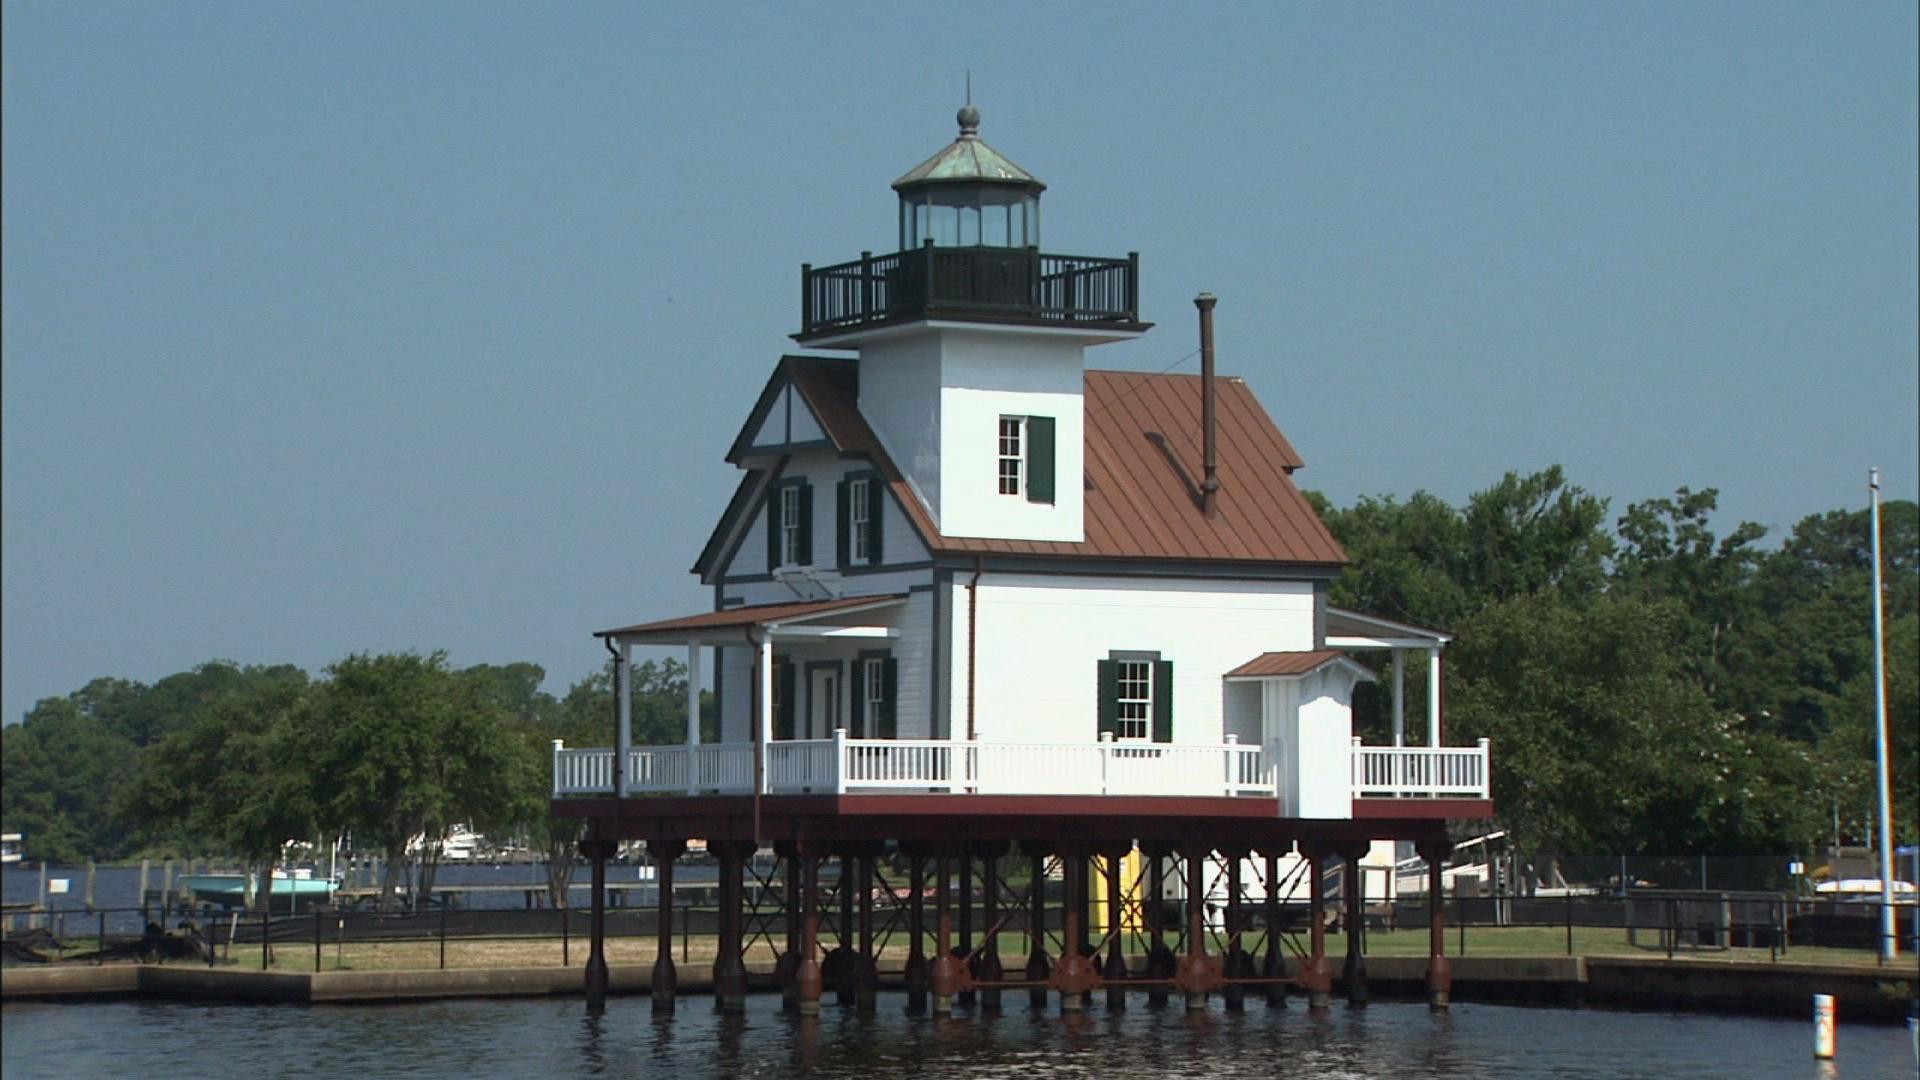 Roanoke River Lighthouse image